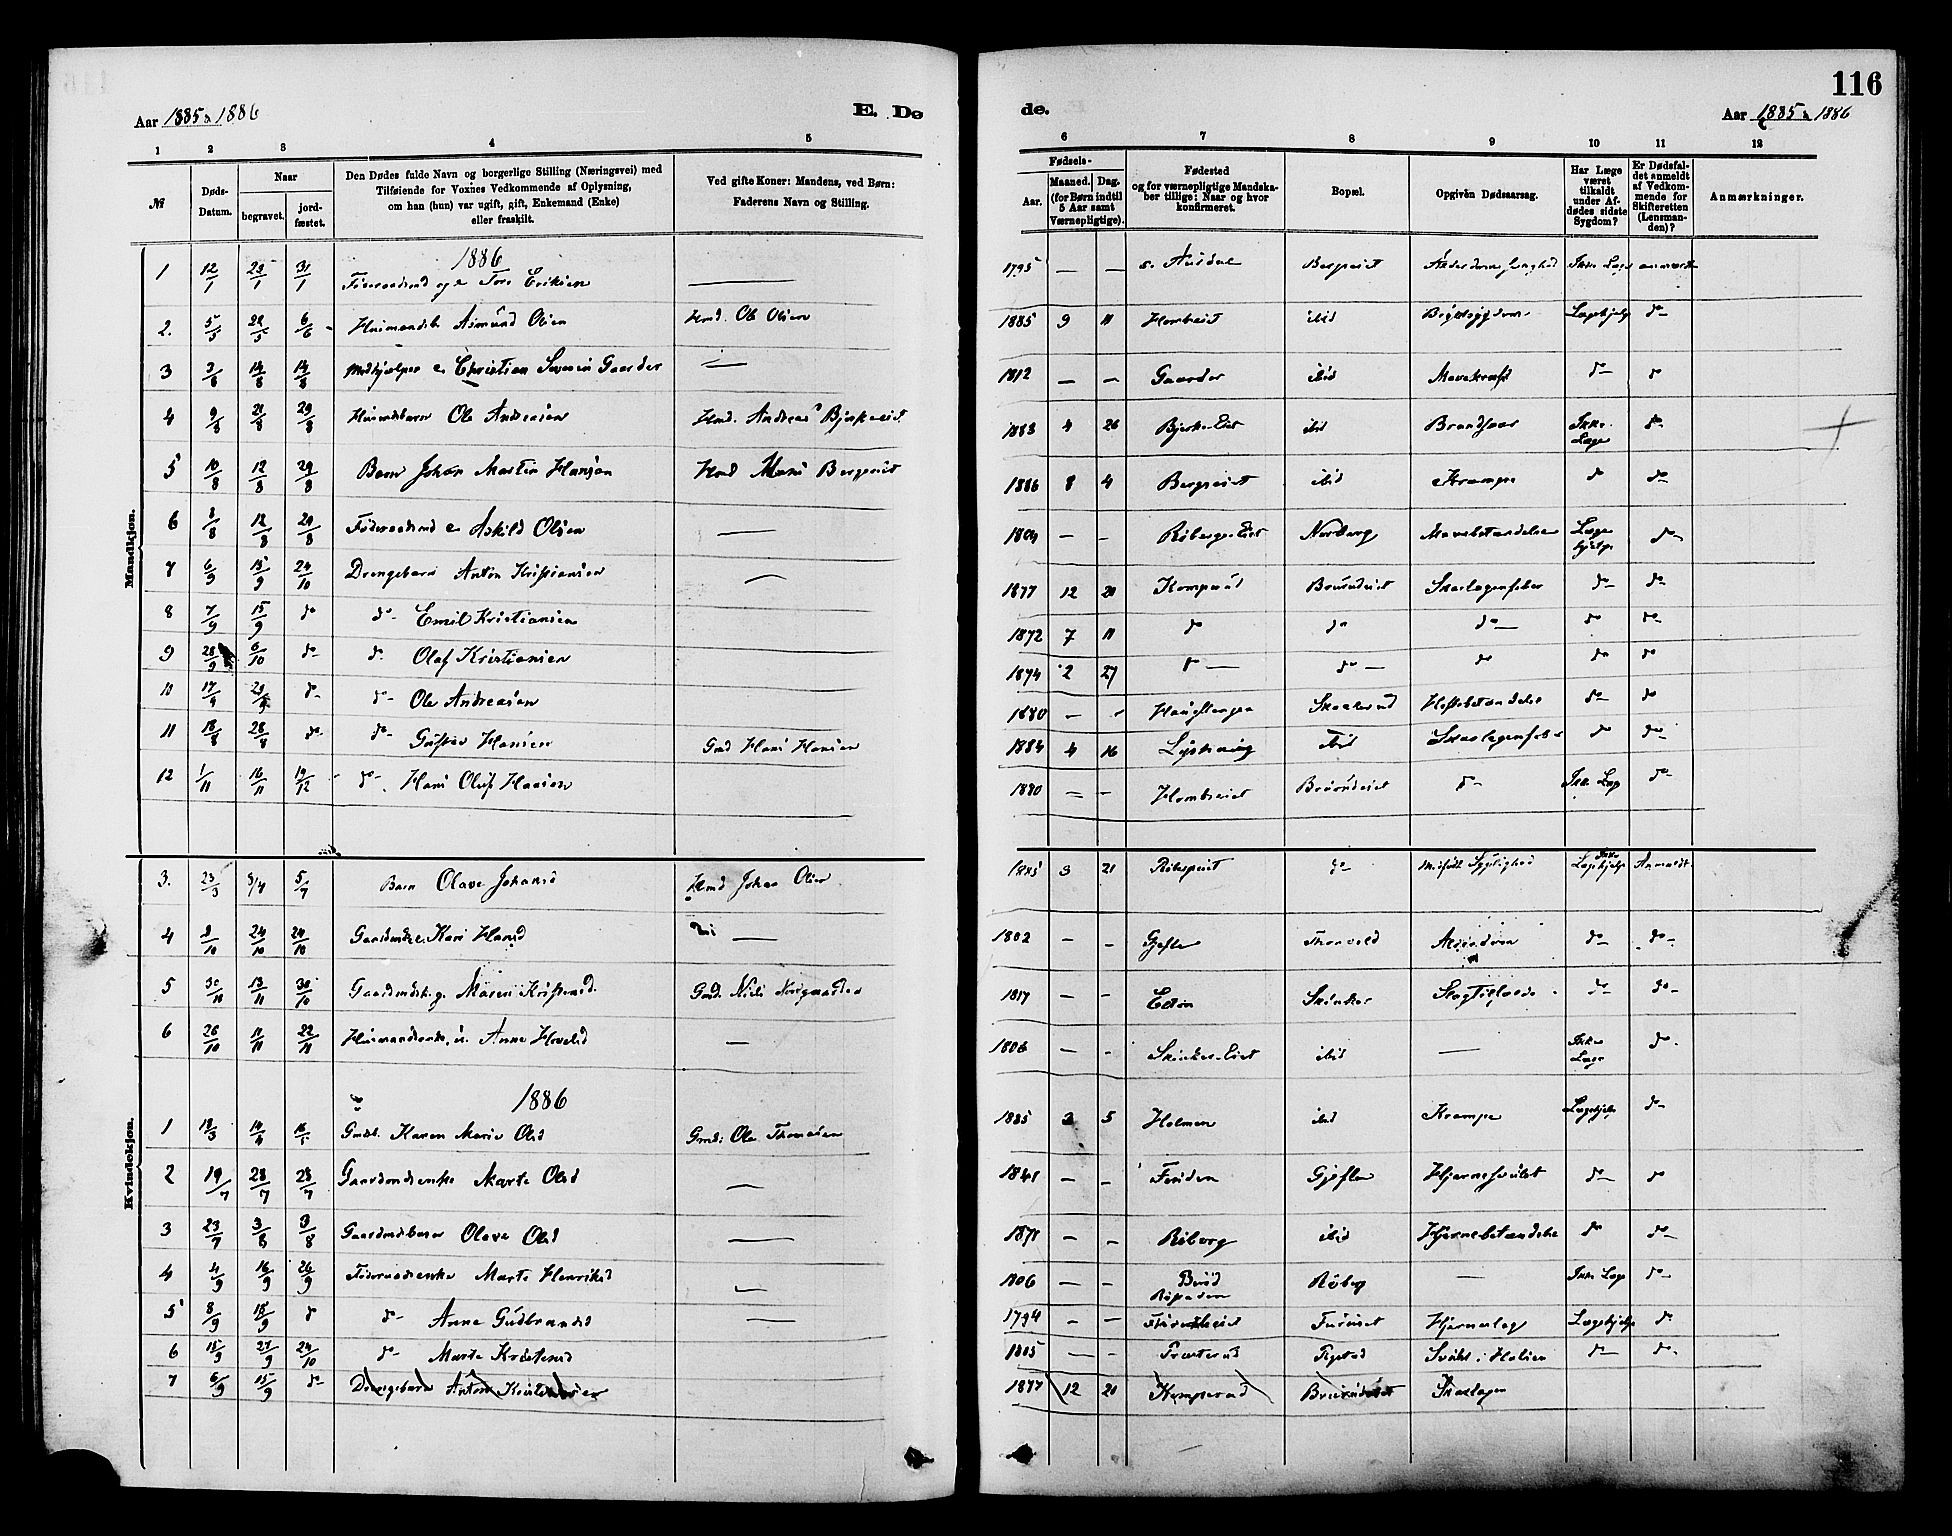 SAH, Nordre Land prestekontor, Ministerialbok nr. 3, 1882-1896, s. 116